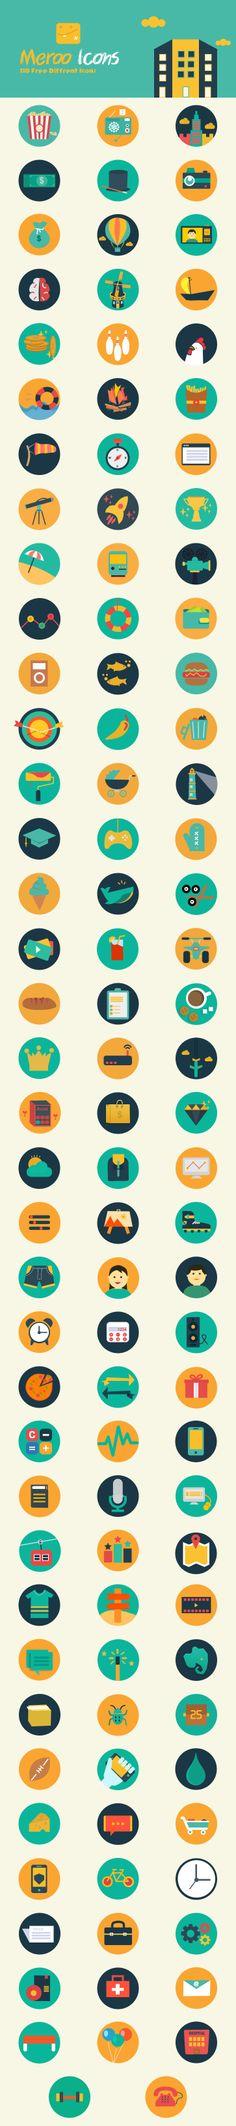 Meroo Icons - 110 Free Flat Icons